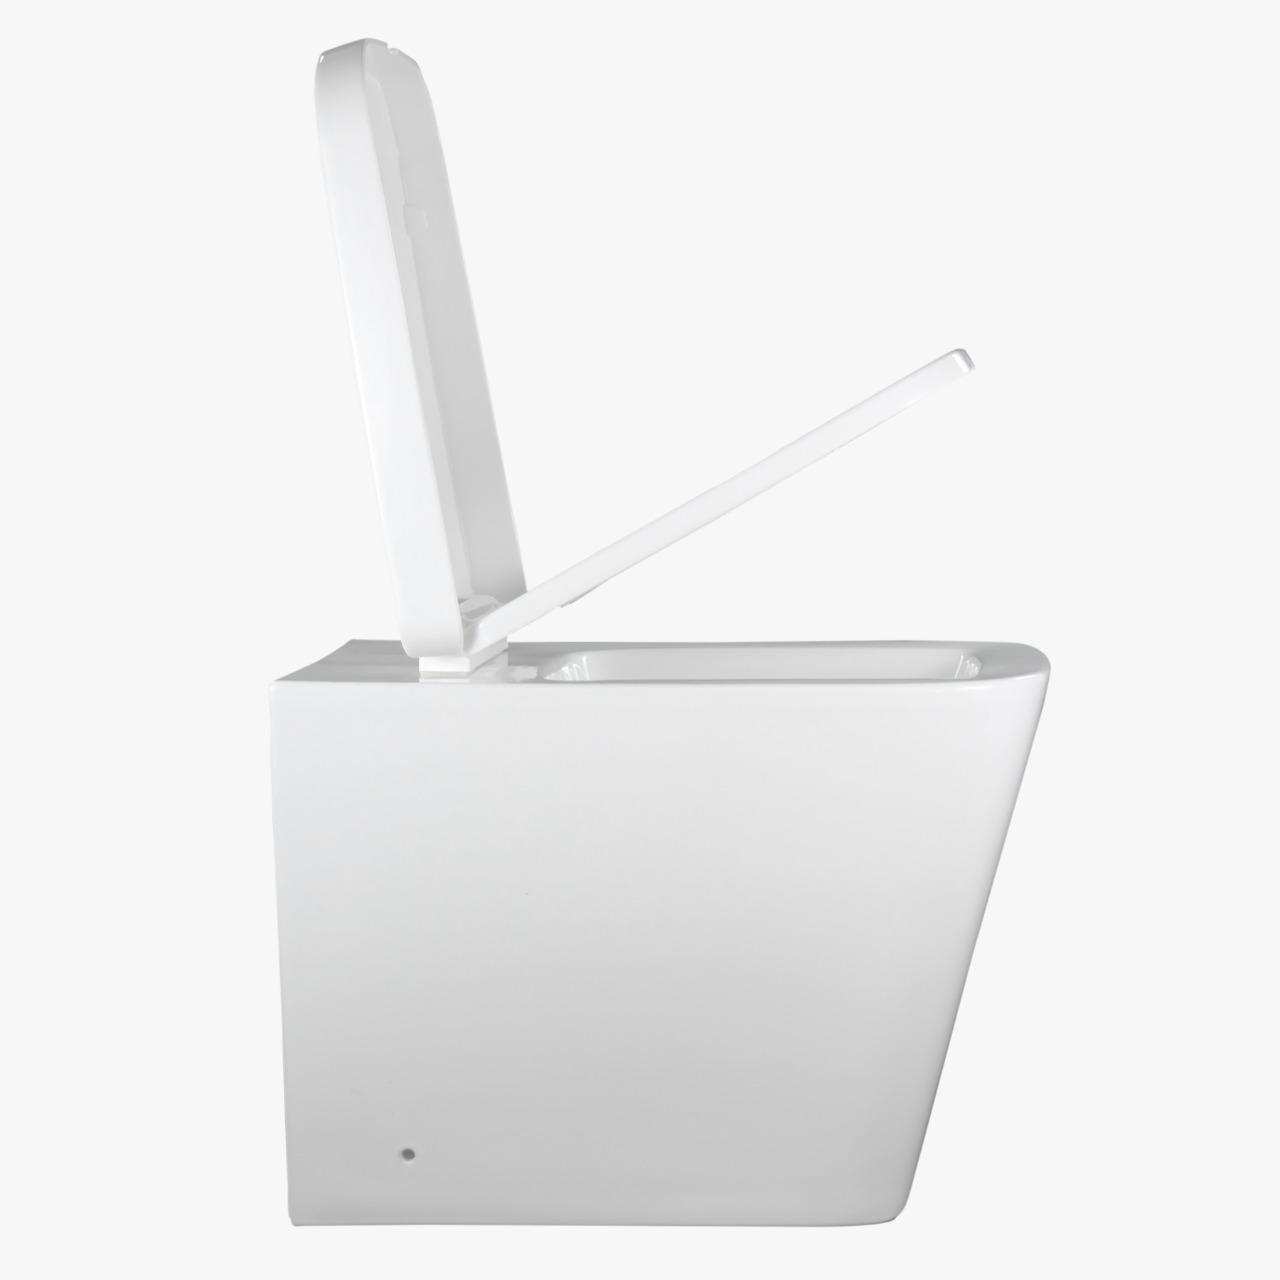 Vaso Sanitário Convencional Quadrado Branco Lux